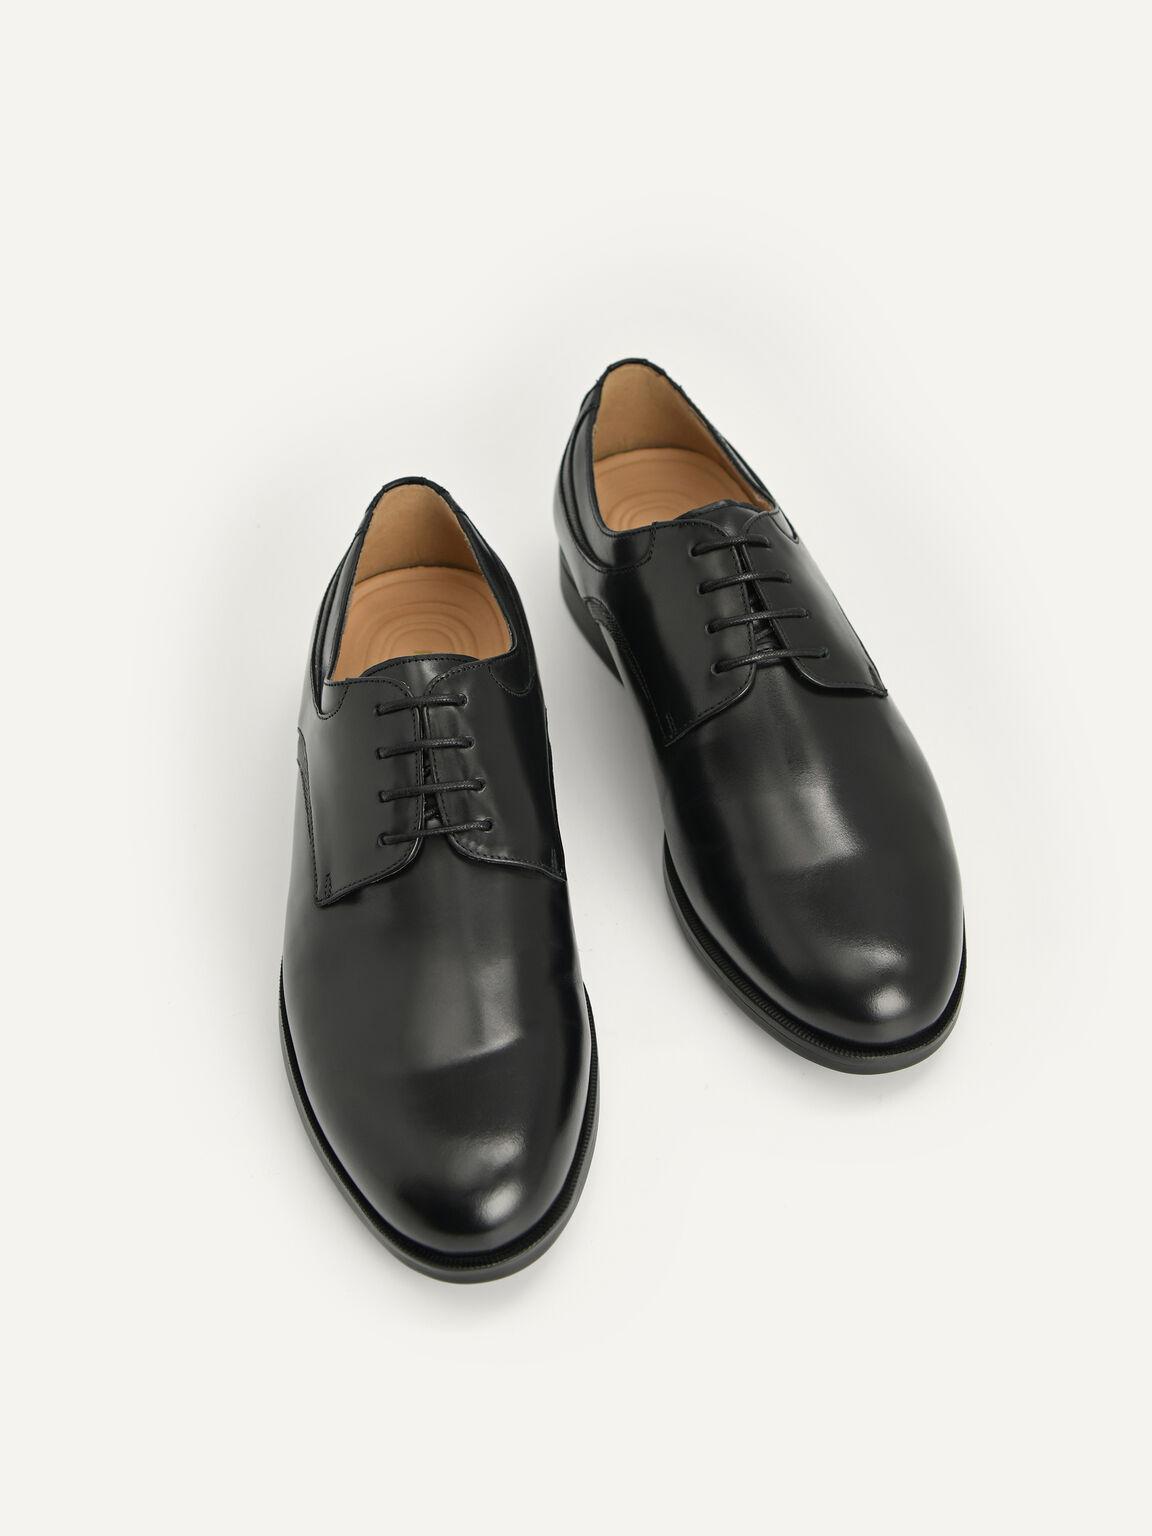 Altitude Leather Derby Shoes, Black, hi-res